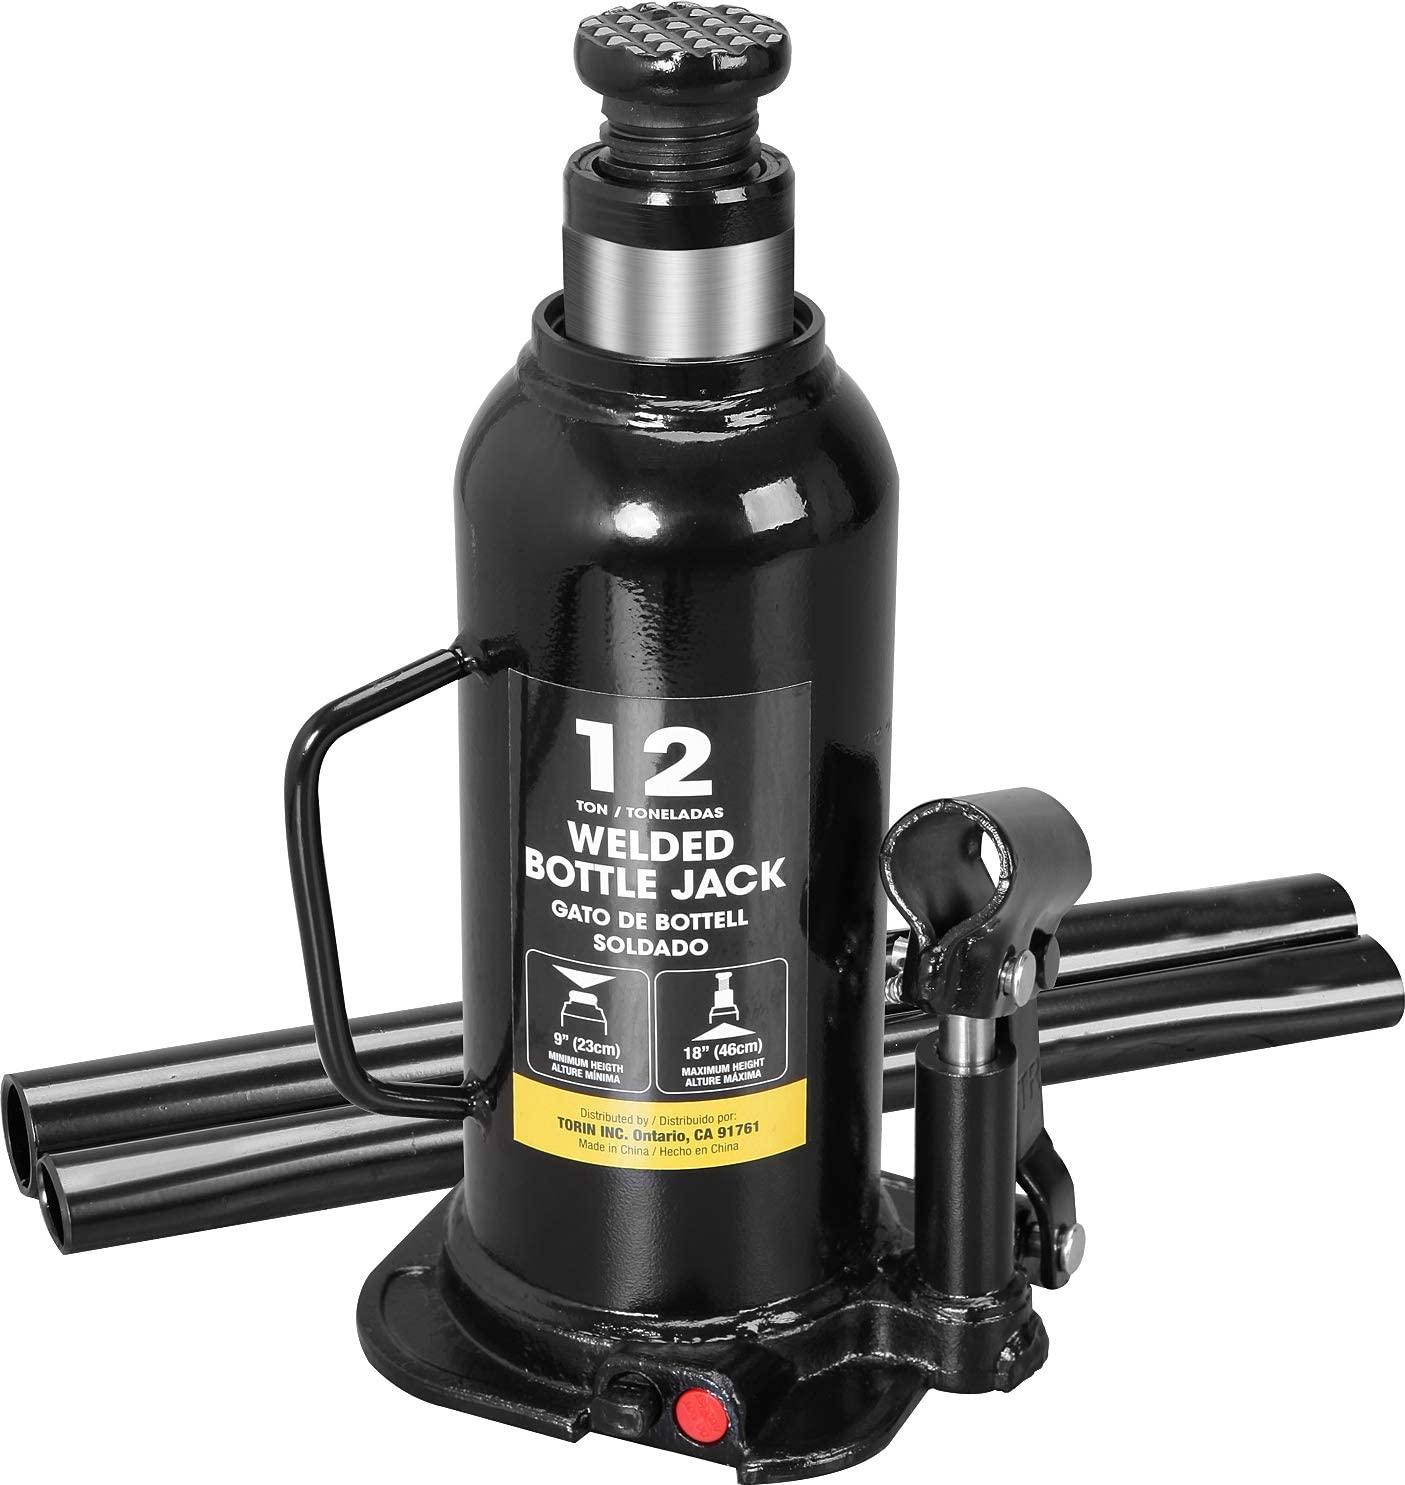 Torin AT91203BB Hydraulic Welded Bottle Jack, 12 Ton (24,000 lb) Capacity, Black